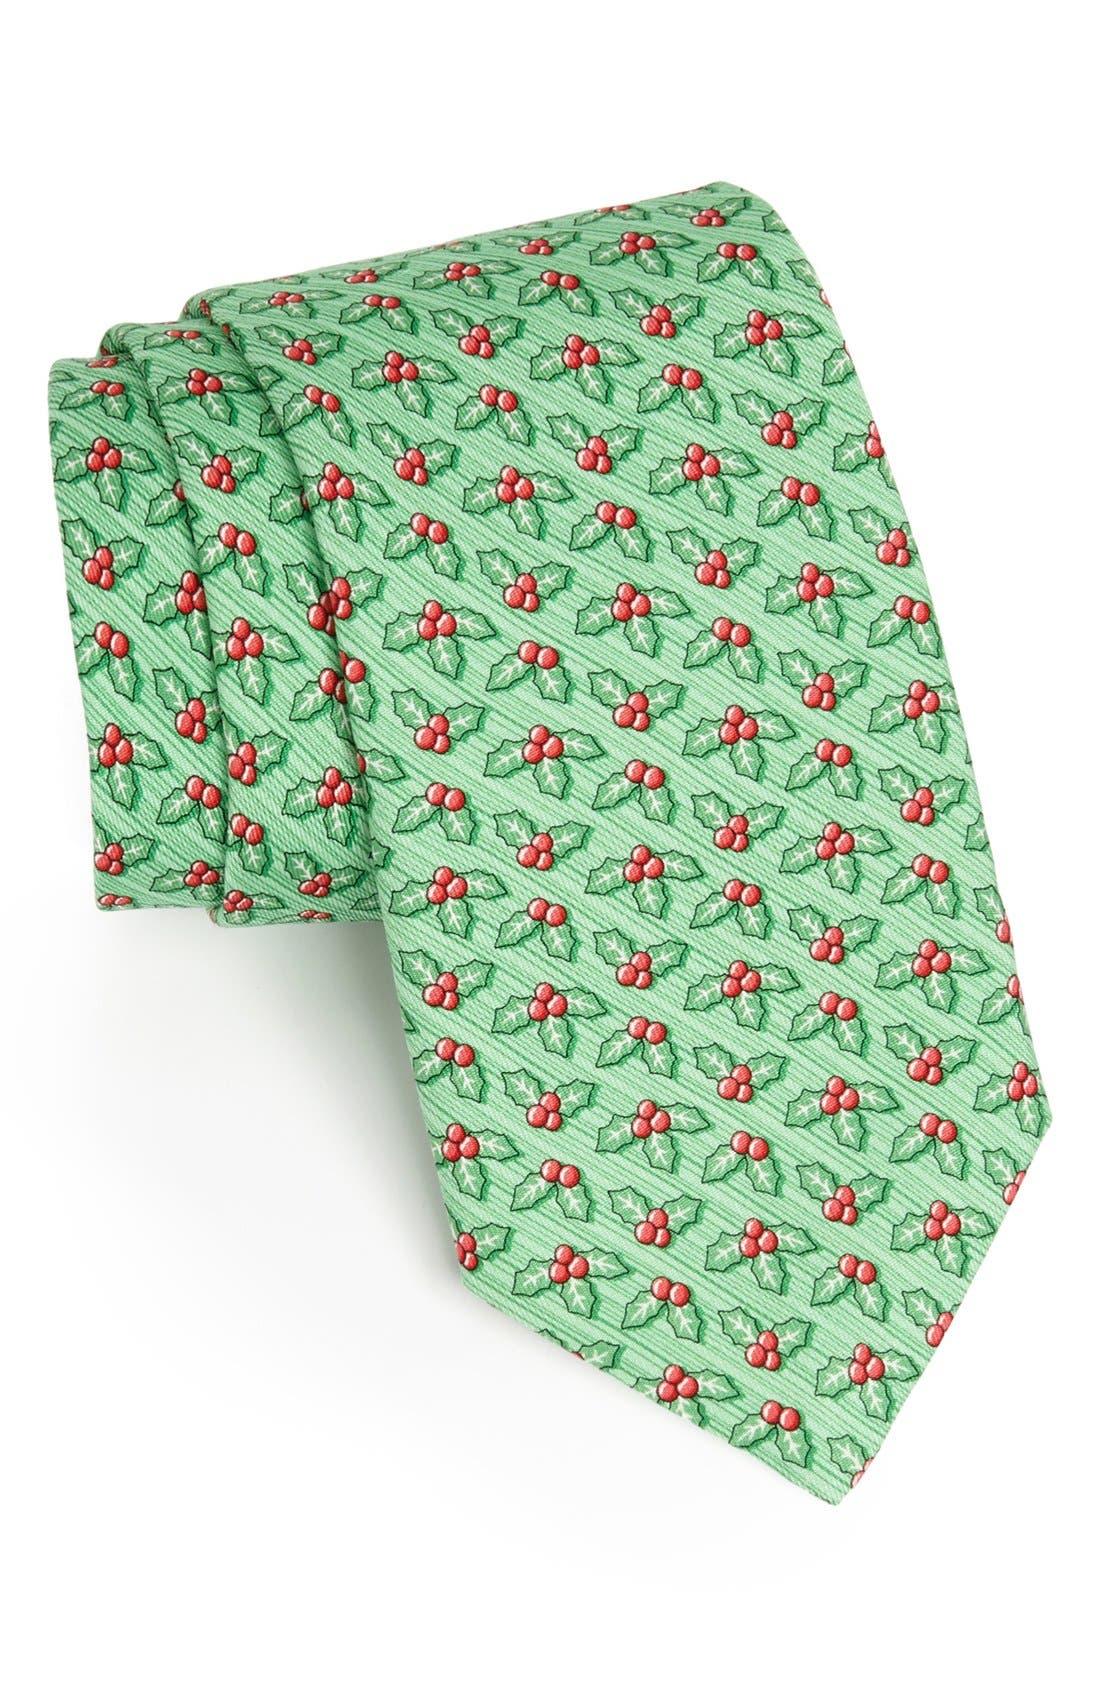 Main Image - Vineyard Vines Holly Berry Print Silk Tie